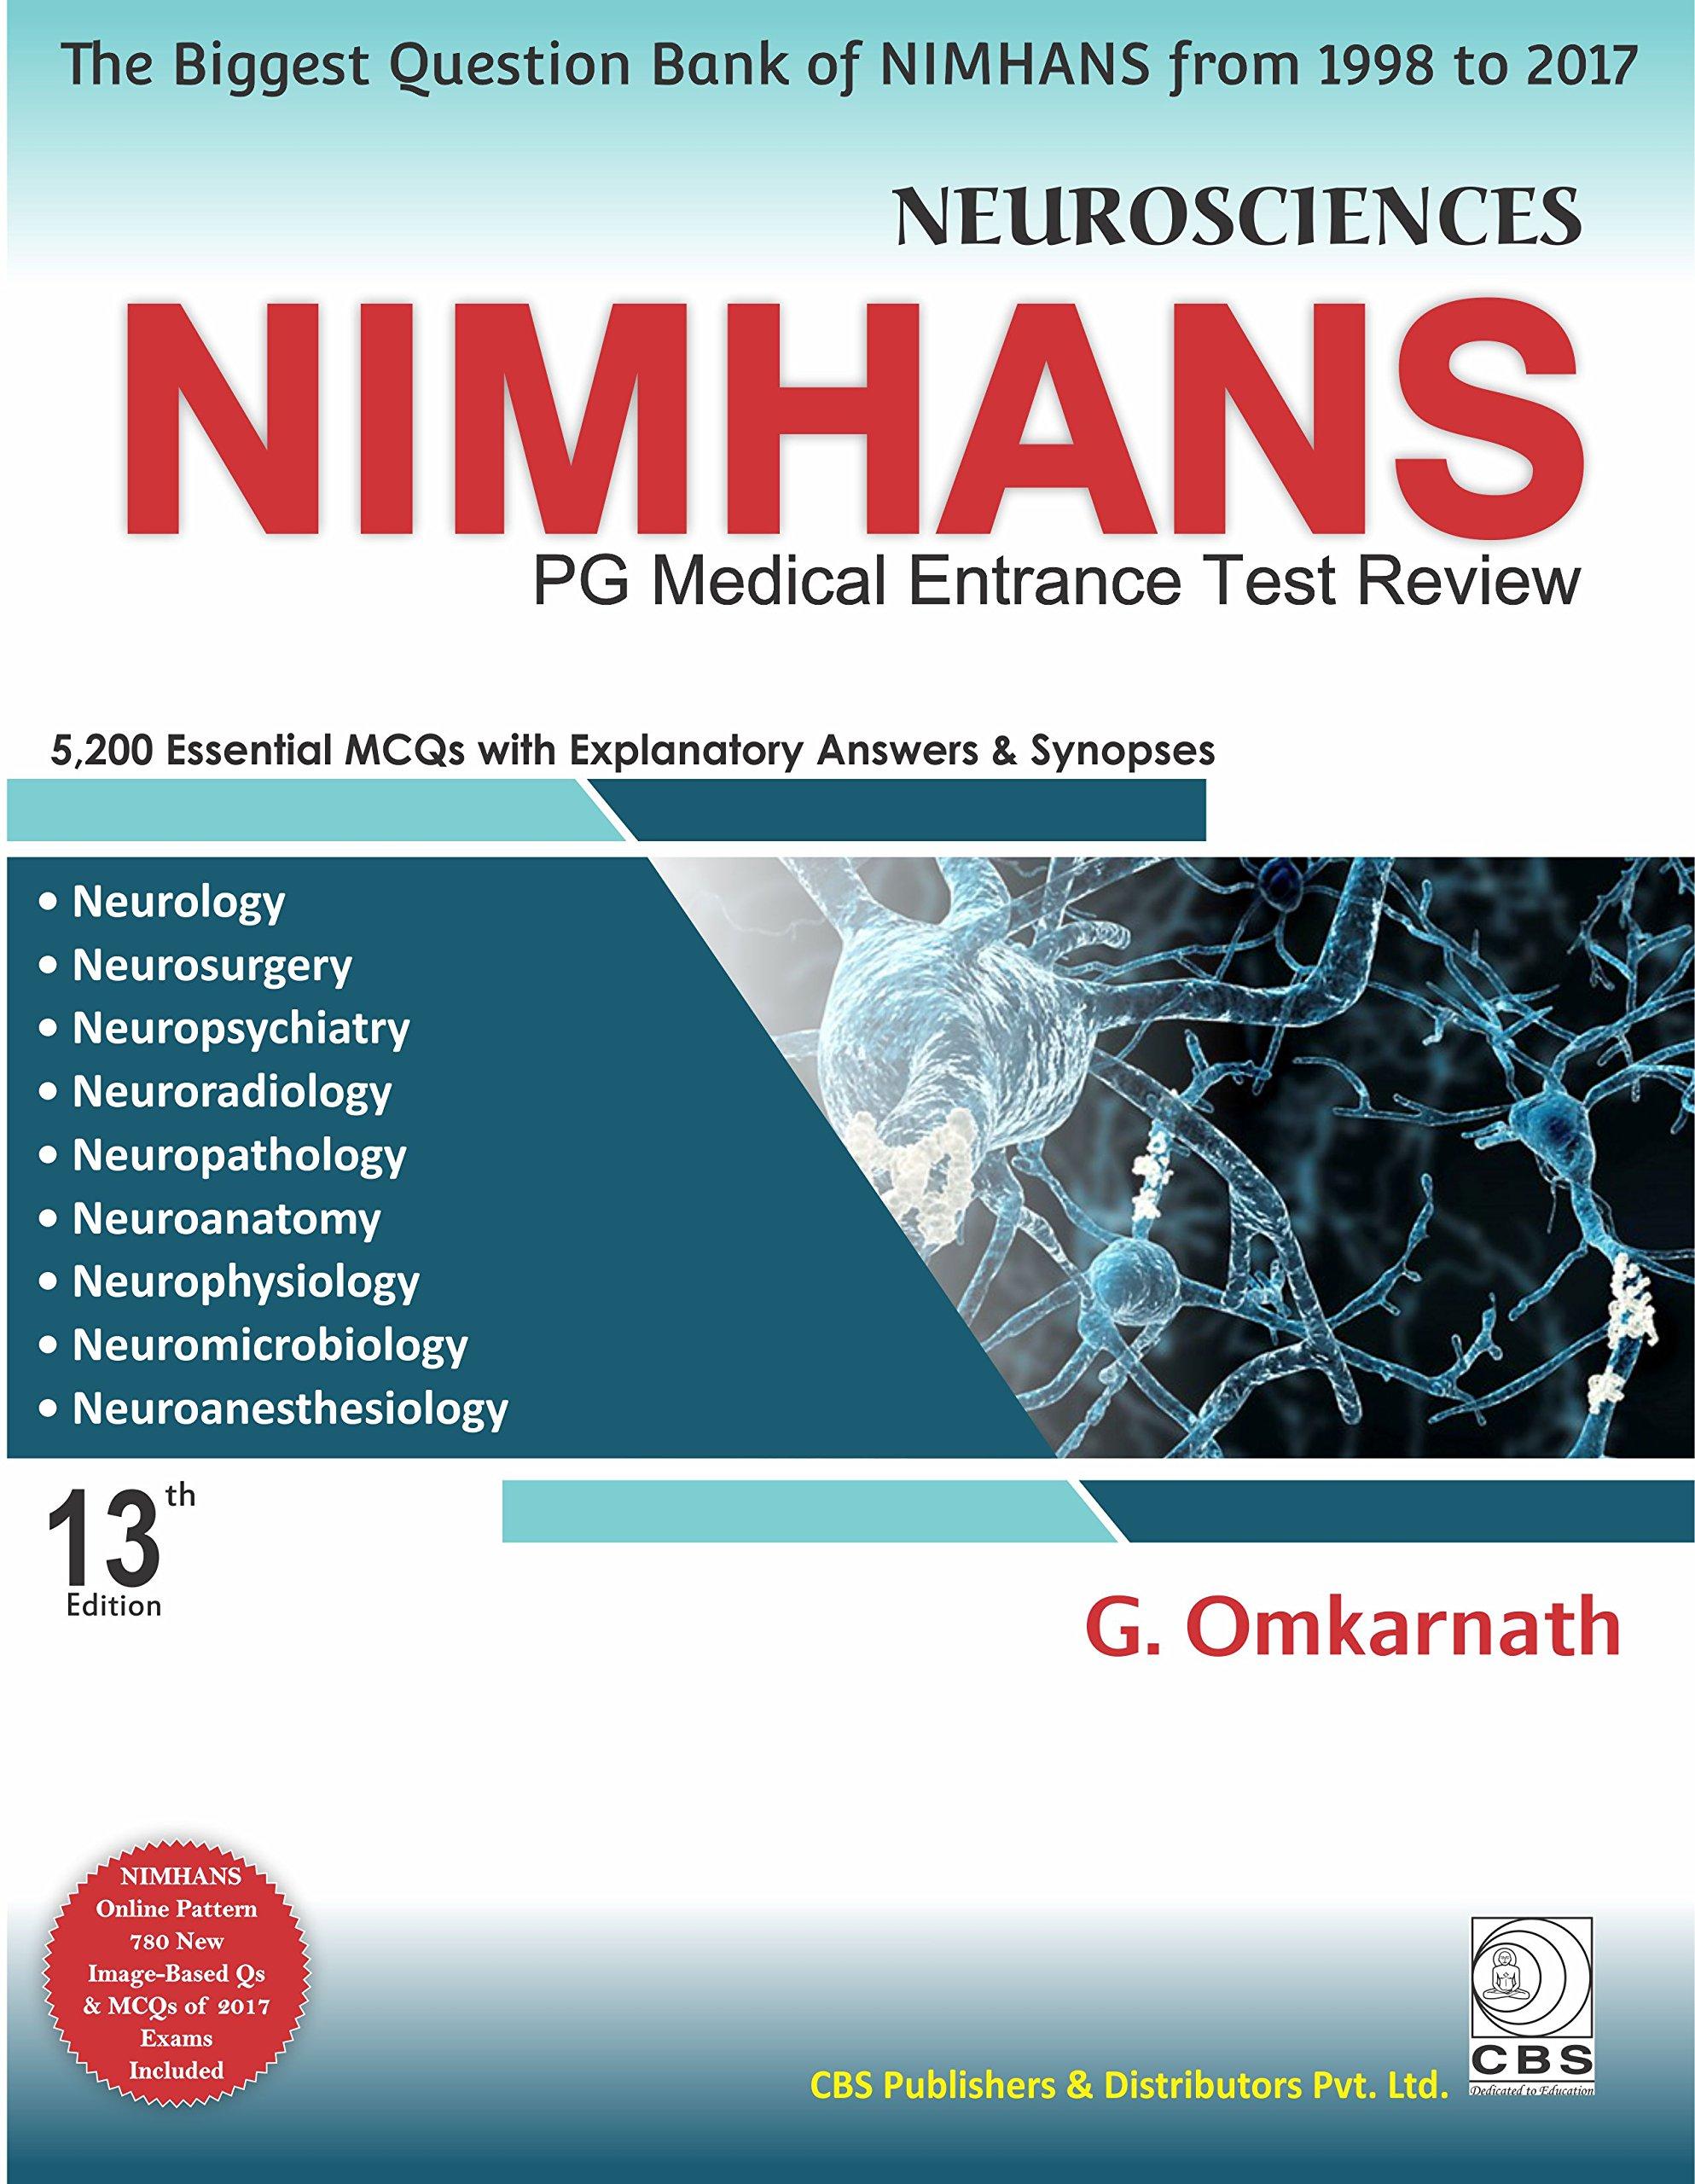 Buy Neurosciences NIMHANS-PG Medical Entrance Test Review